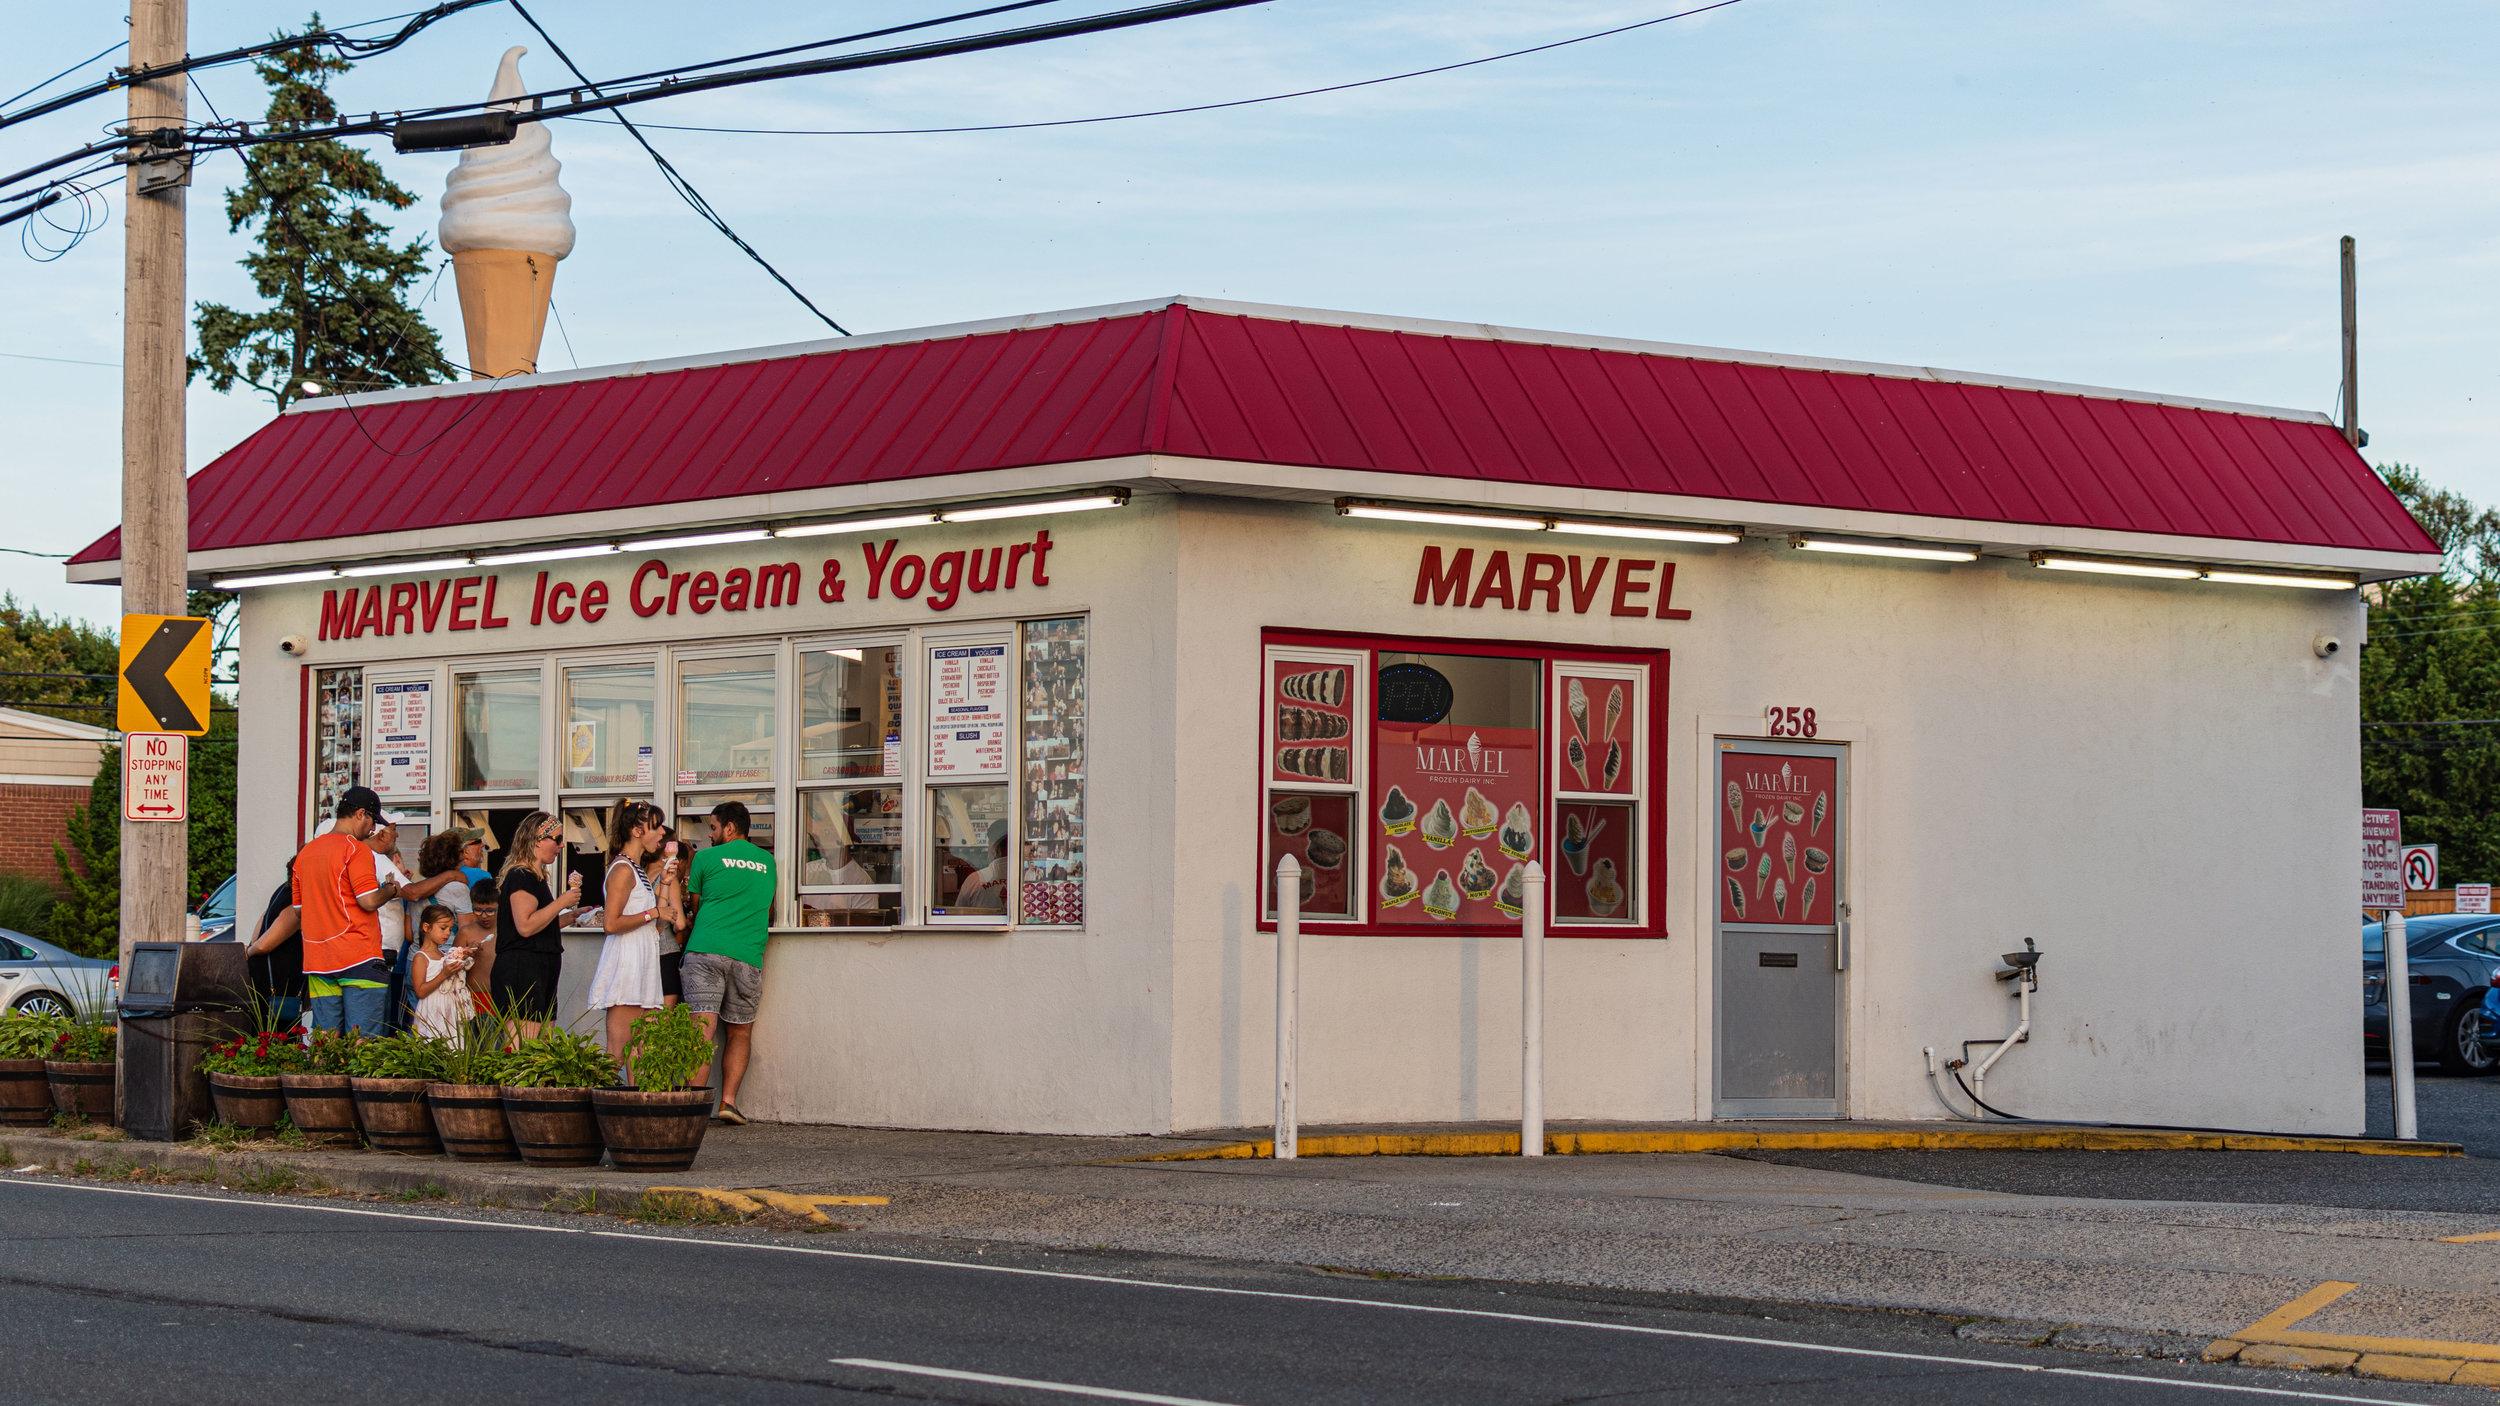 Marvel_Ice_cream_building.jpg